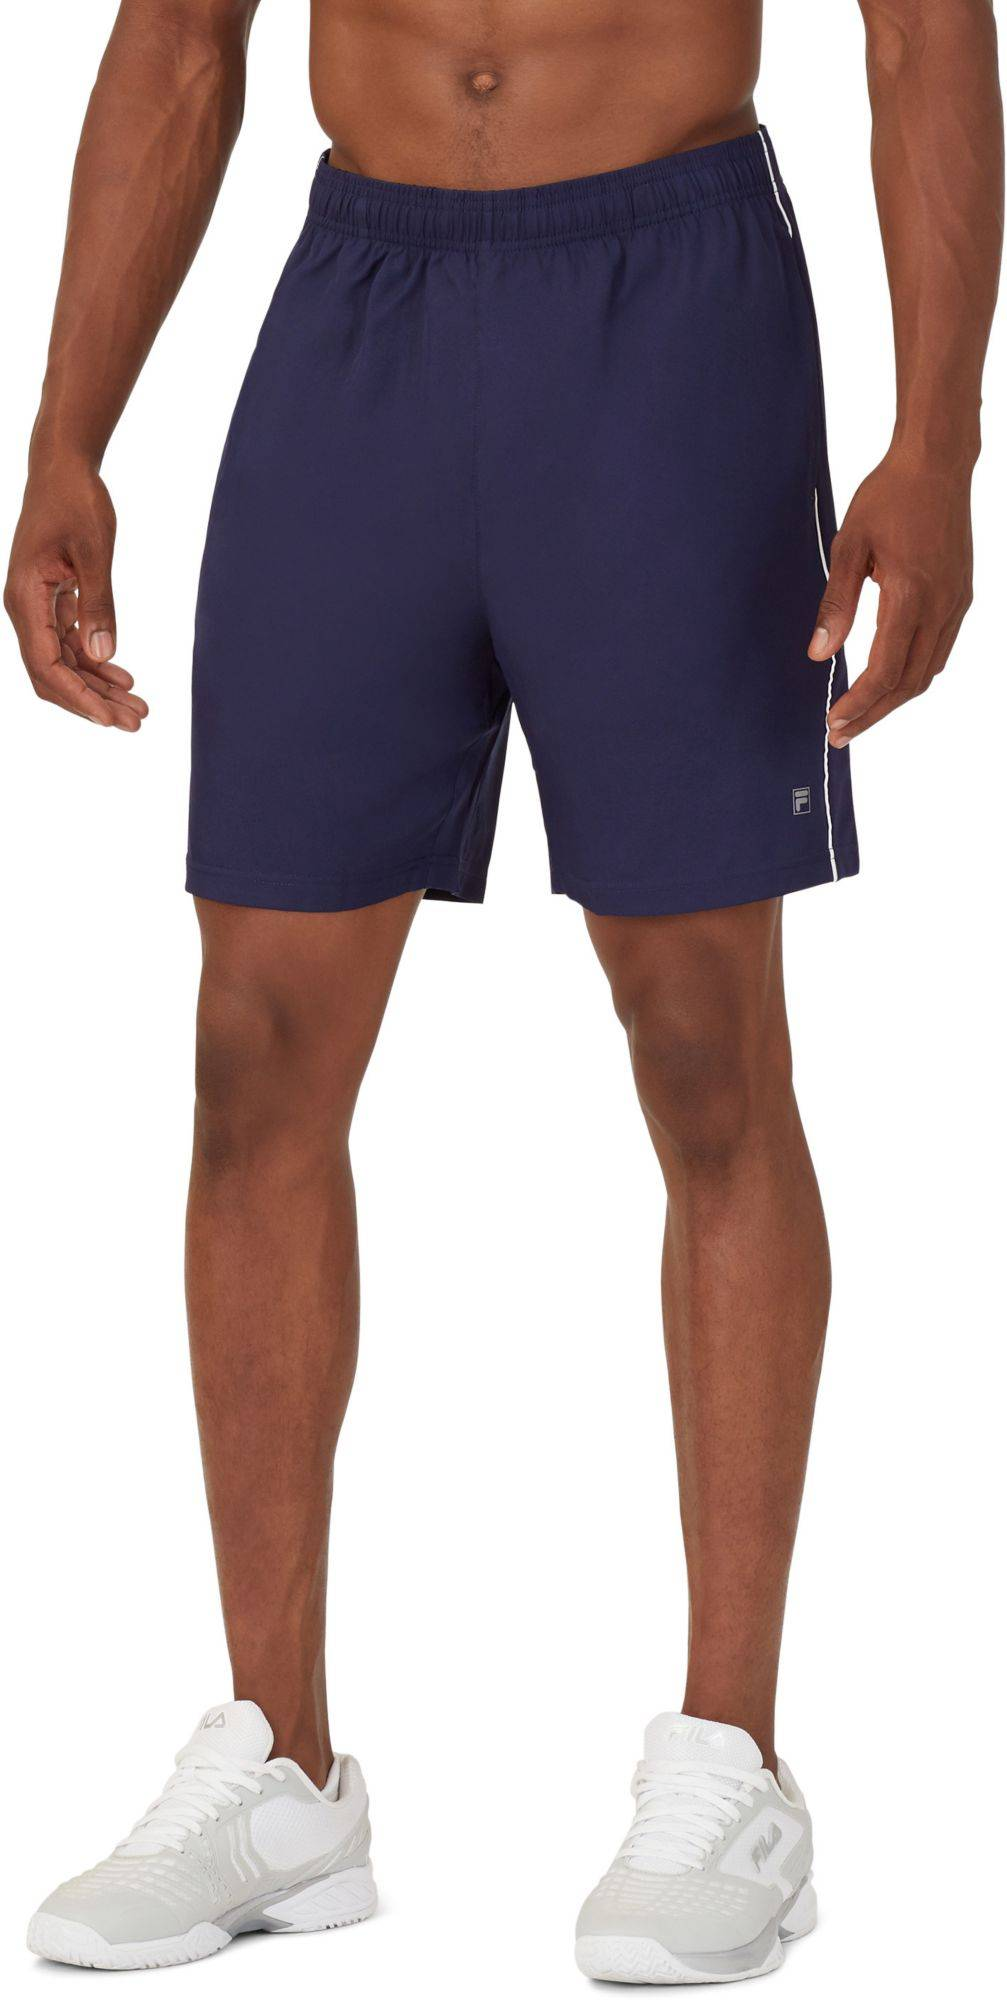 "Fila Men's Core 7"" Tennis Shorts, Small, Blue"